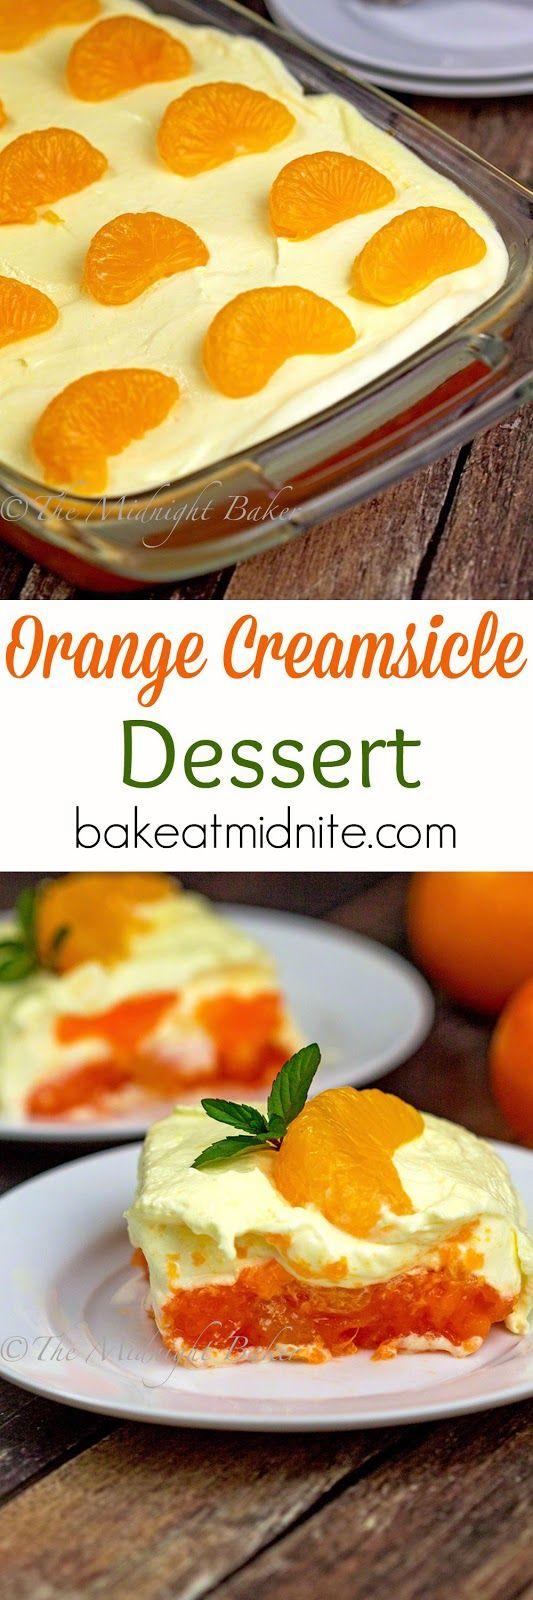 Orange Creamsicle Dessert – The Midnight Baker